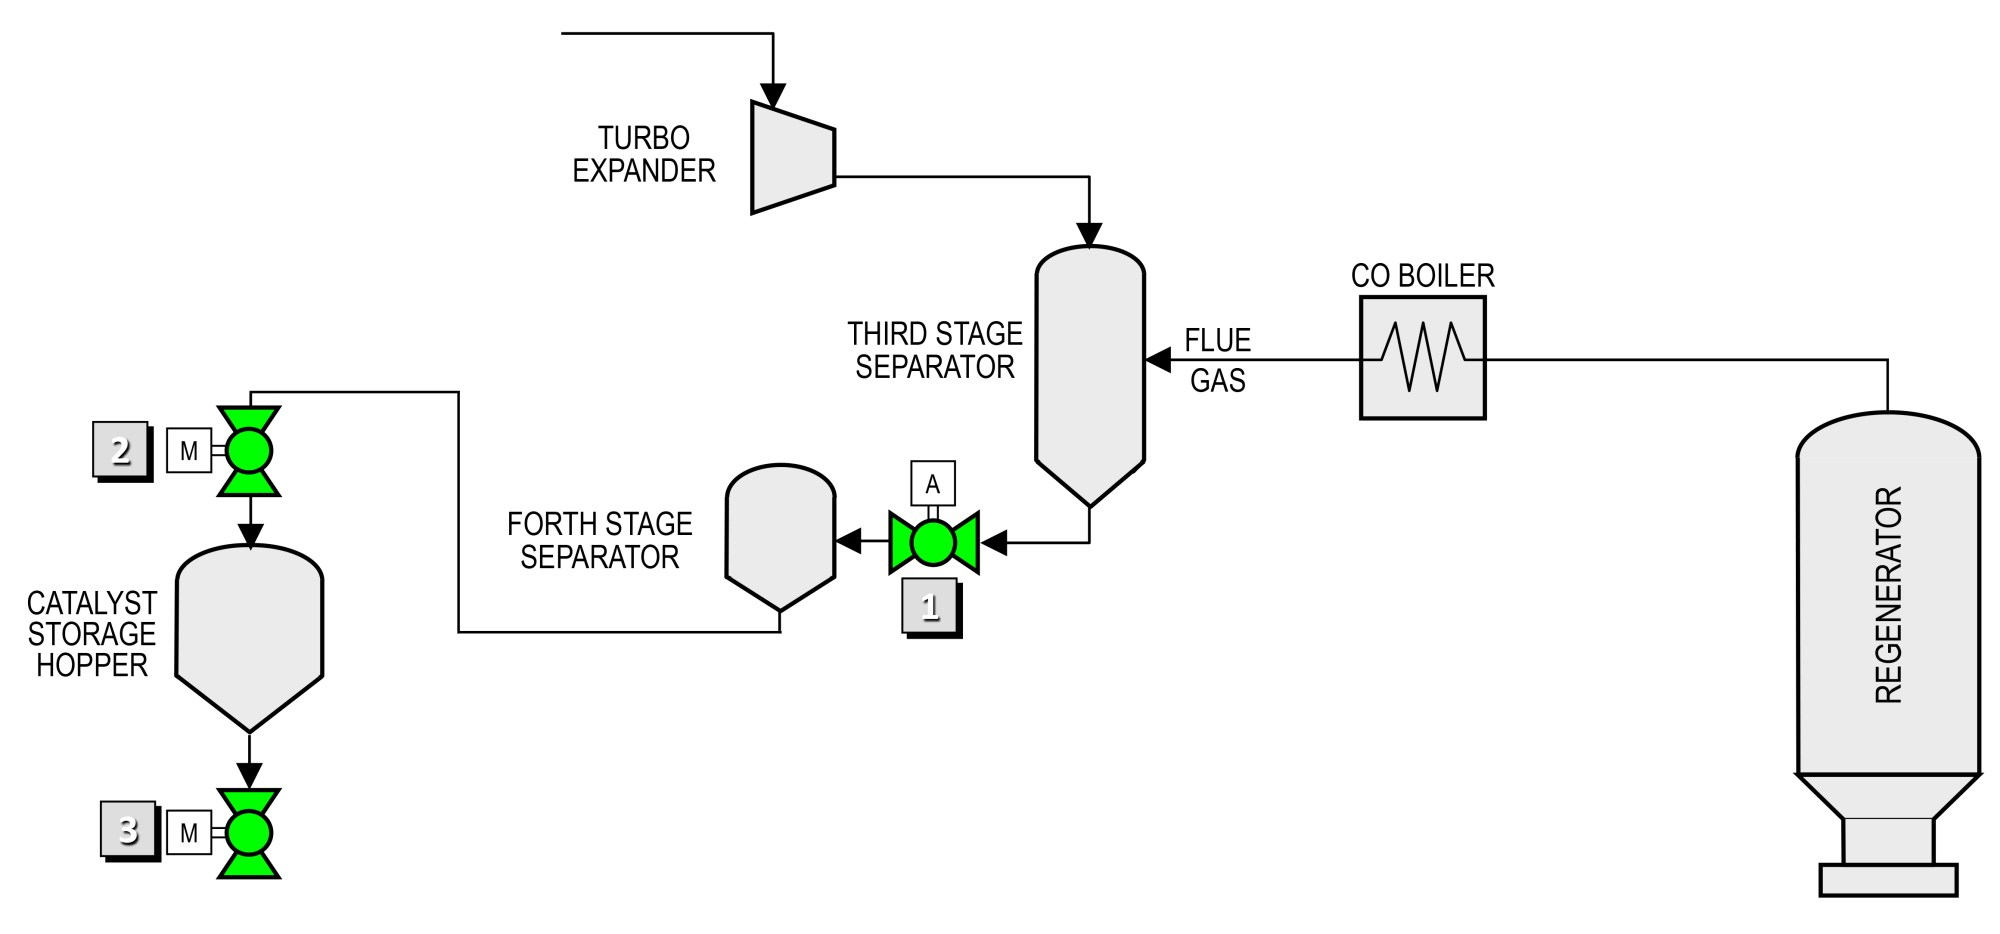 hight resolution of futronic iv eim wiring diagrams on coil schematic diagram www valv com wp content uploads 2018 08 torqplustm electric valve actuators